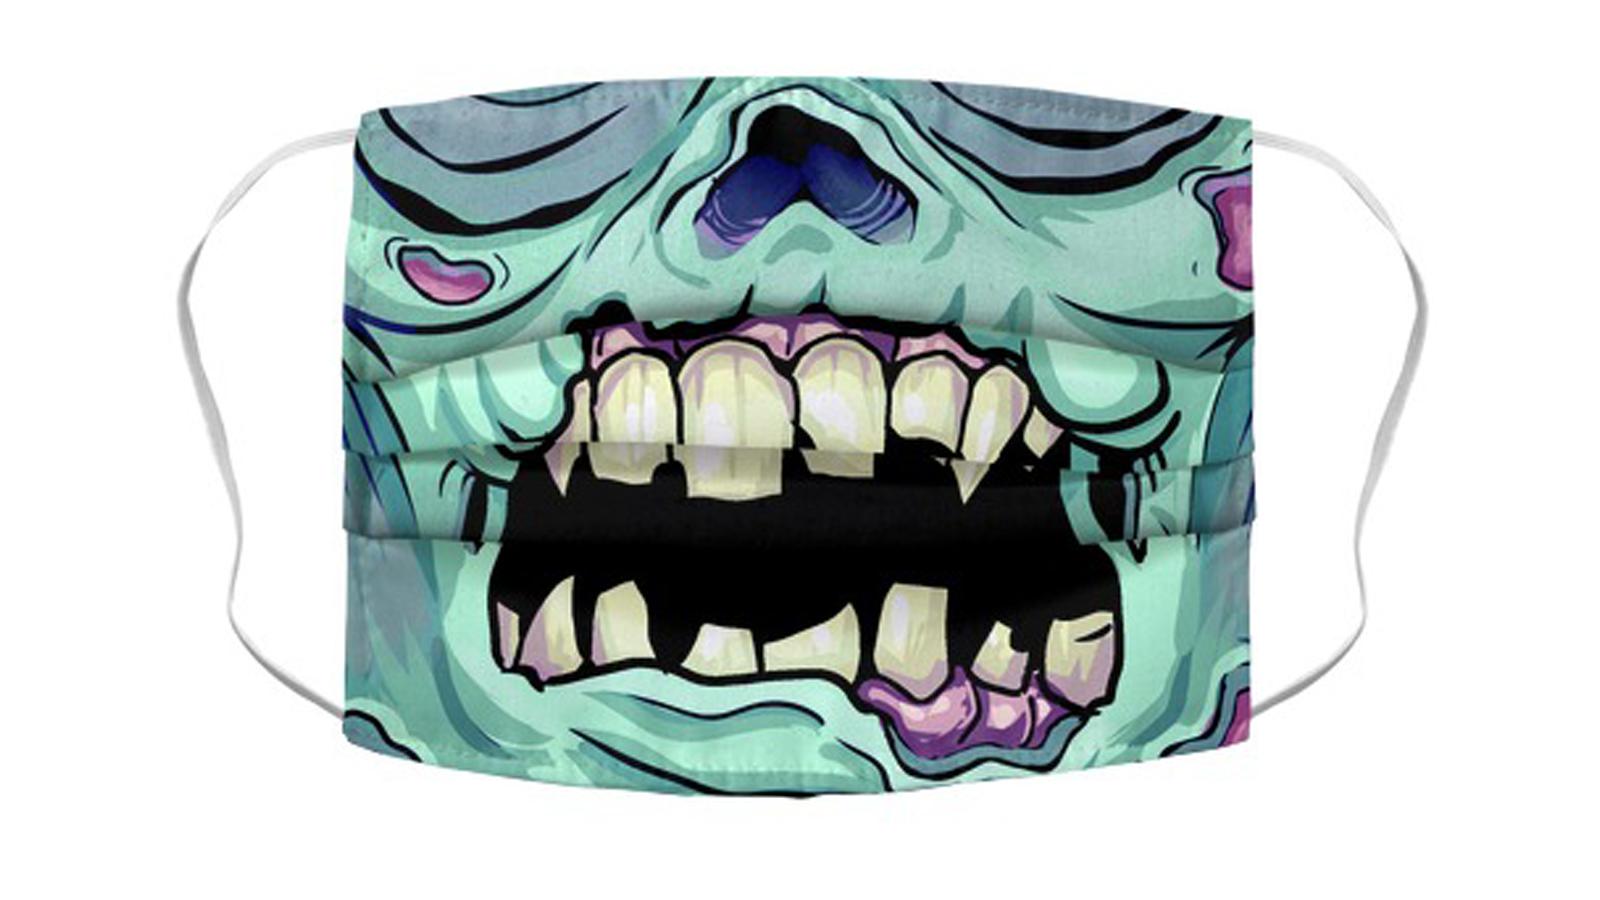 Best zombie face mask the walking dead the last of us walkers biters